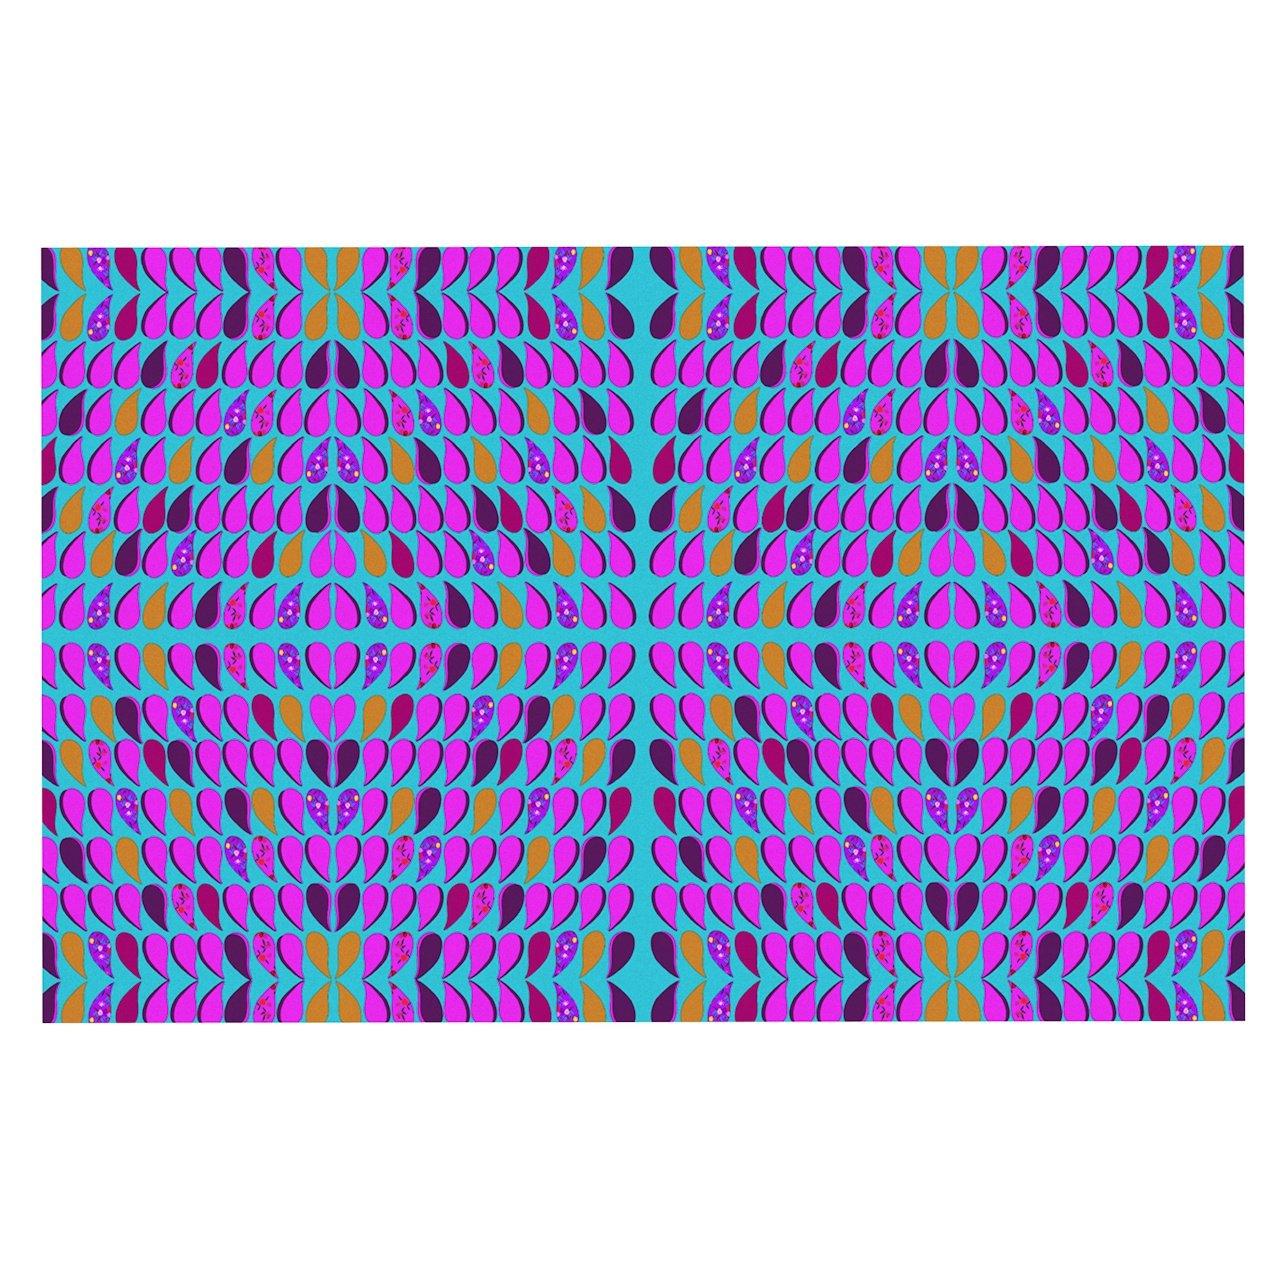 KESS InHouse FS1001ADM02 Fernanda Sternieri Optical Paisley Purple Pink Dog Place Mat, 24  x 15